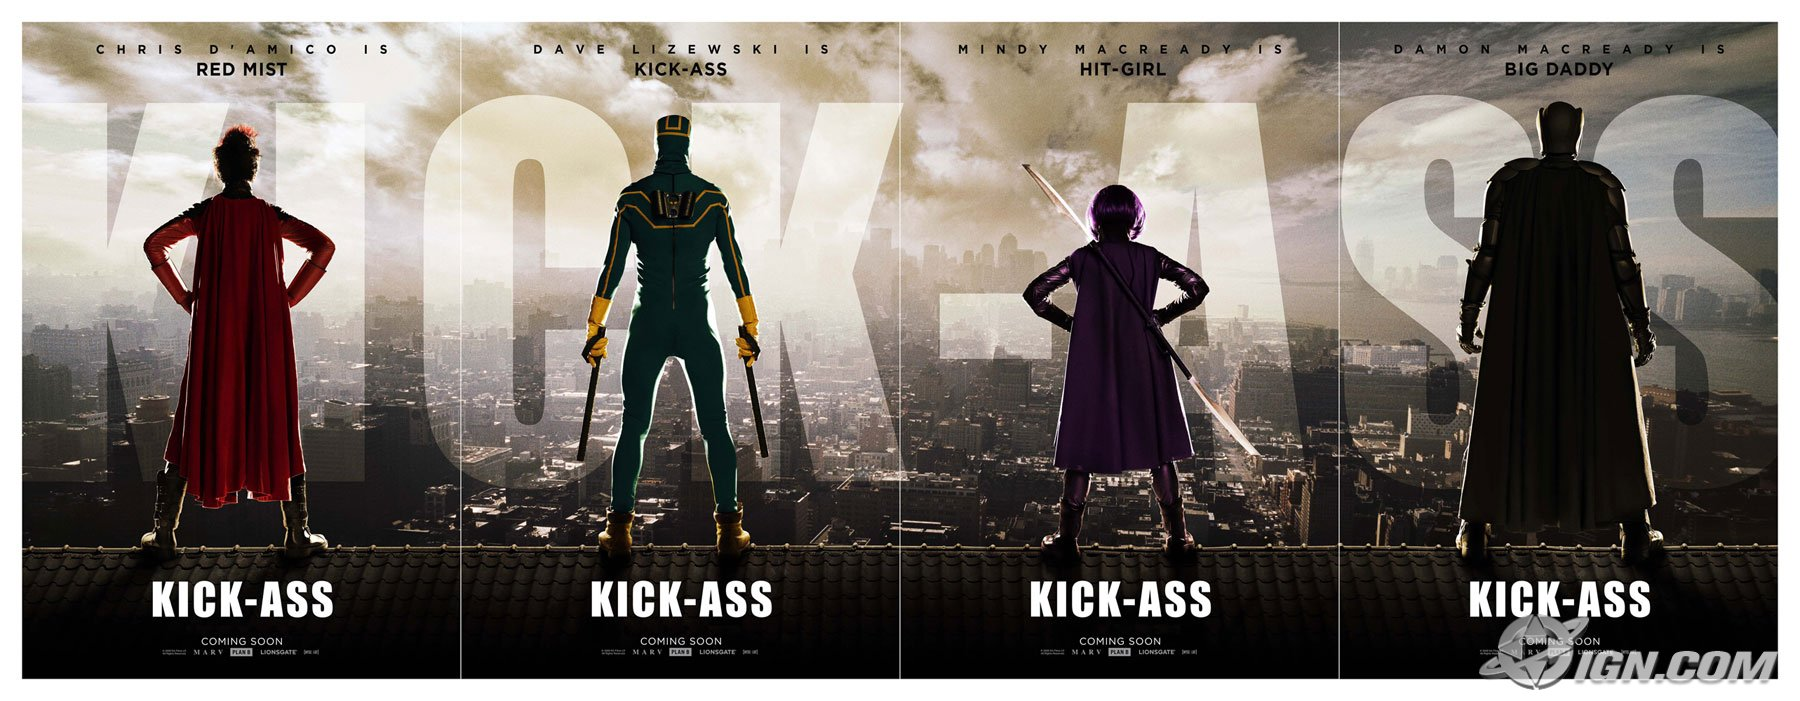 Kick Ass 4284-kick-ass-20091105023449635